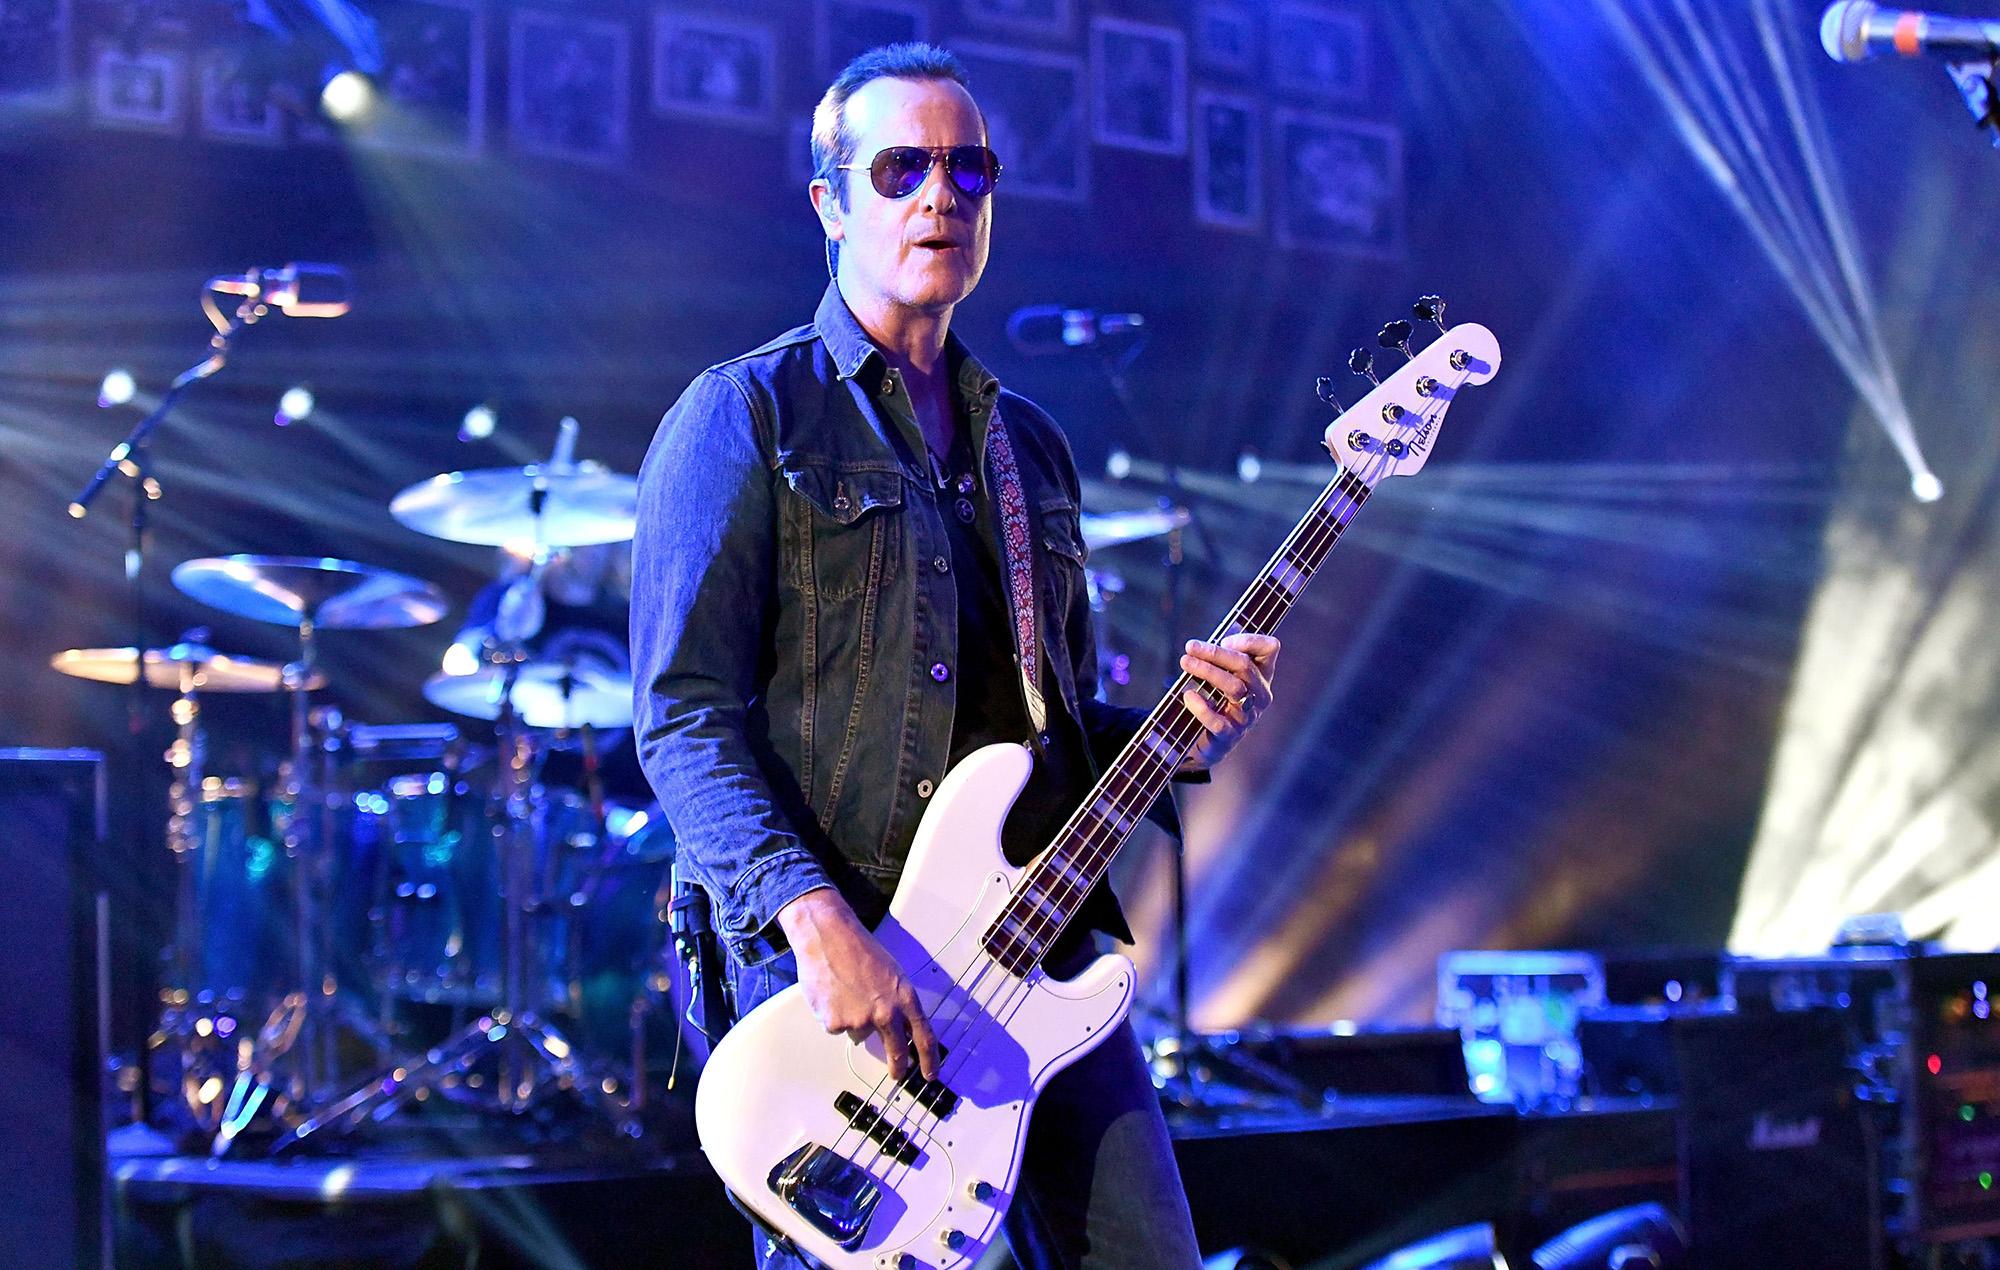 Stone Temple Pilots bassist Robert DeLeo